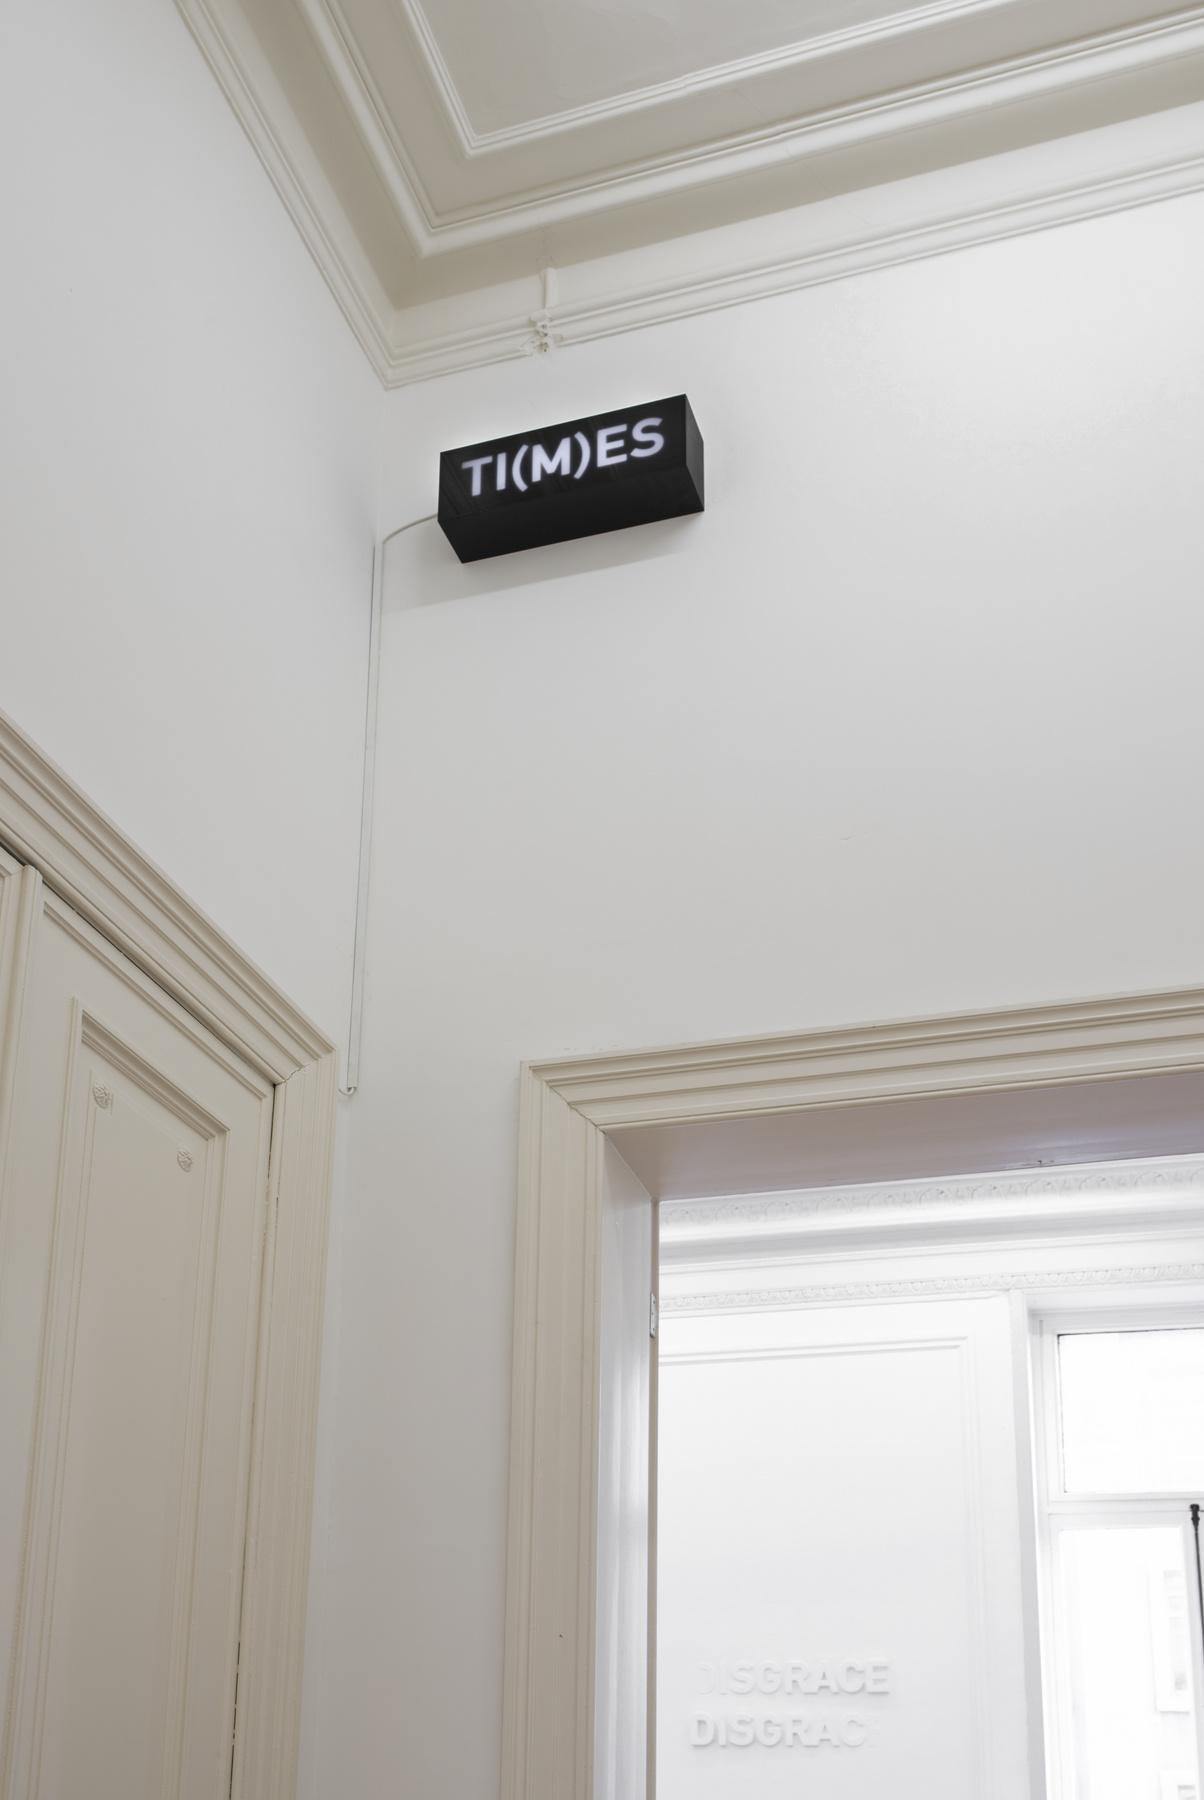 Melik Ohanian, Word(s) — Serie II, TI(M)ES, 2014, Animated lightbox with LED,17 x 50 x 12.5cm 1_1 + 1AP